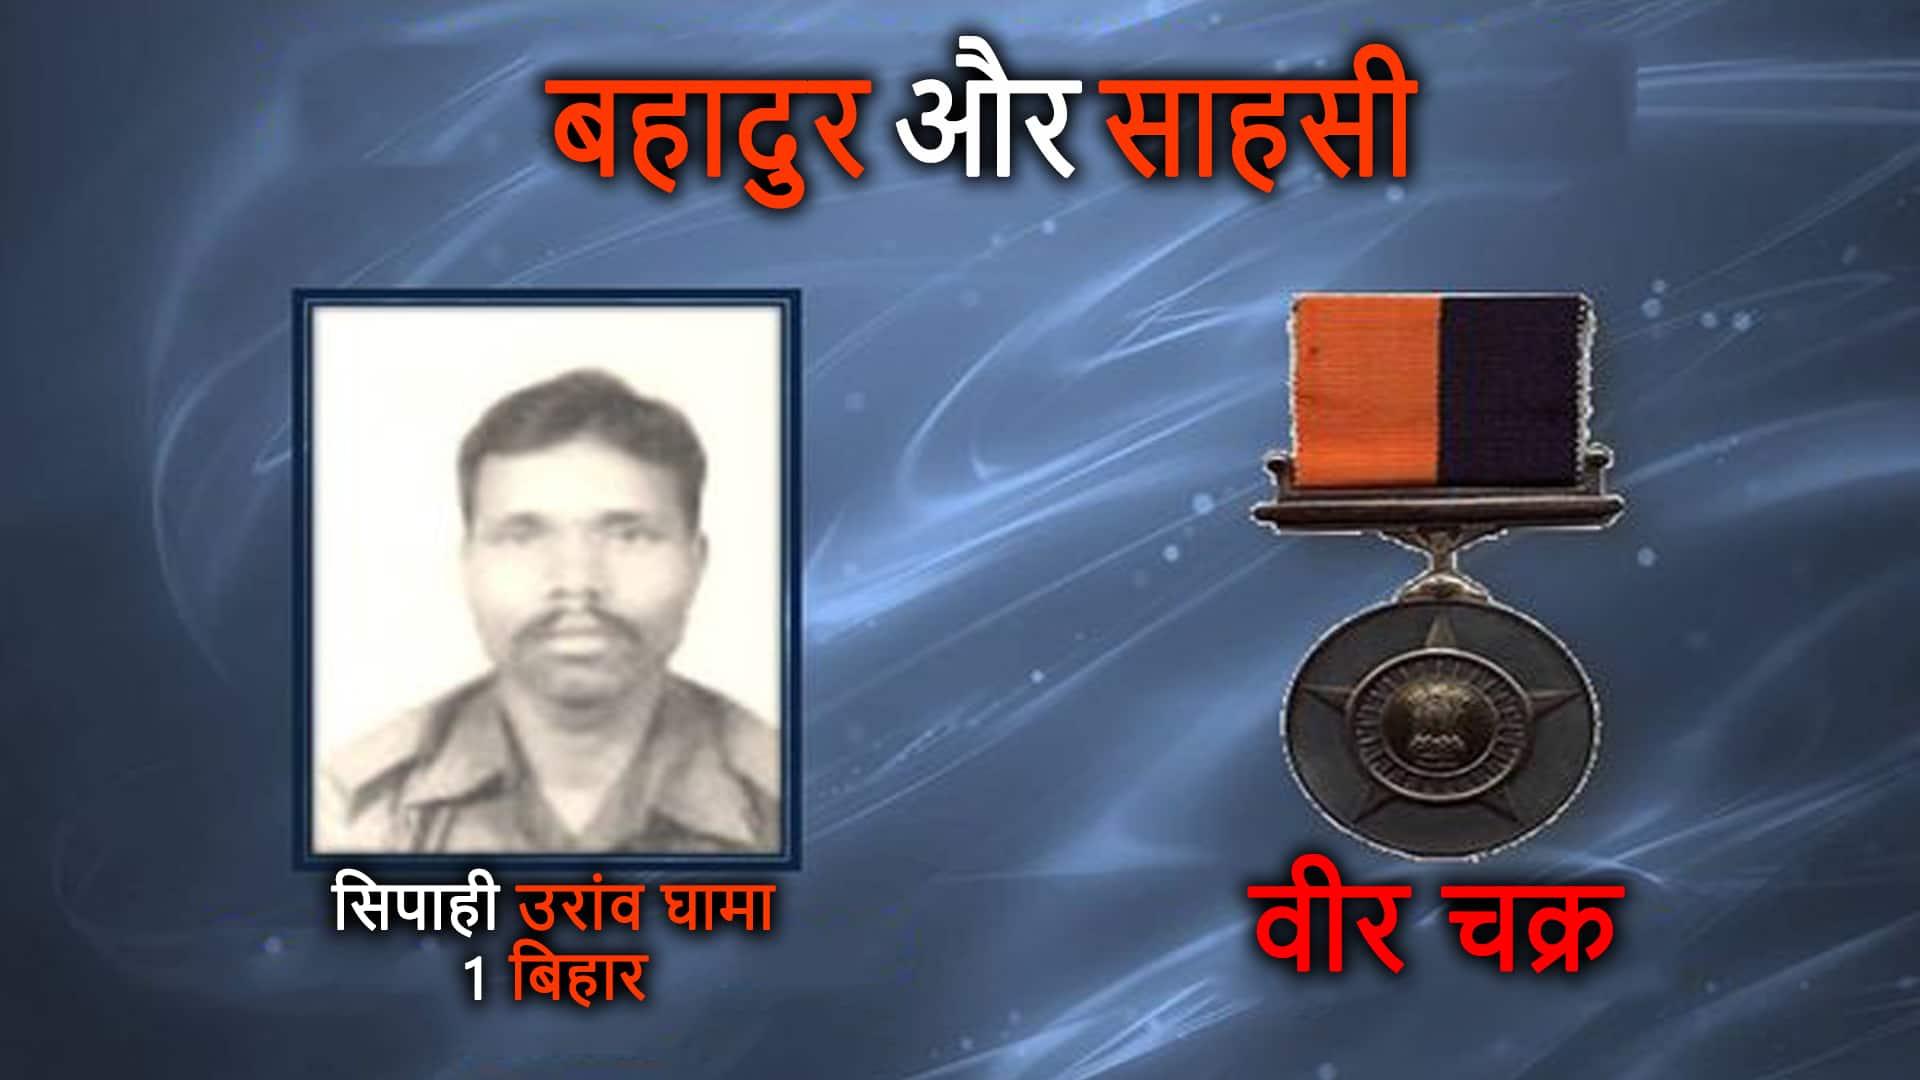 Saluting Naik Ghama Oraon, Vir Chakra, 1 Bihar Regiment, Sri Lanka Ops